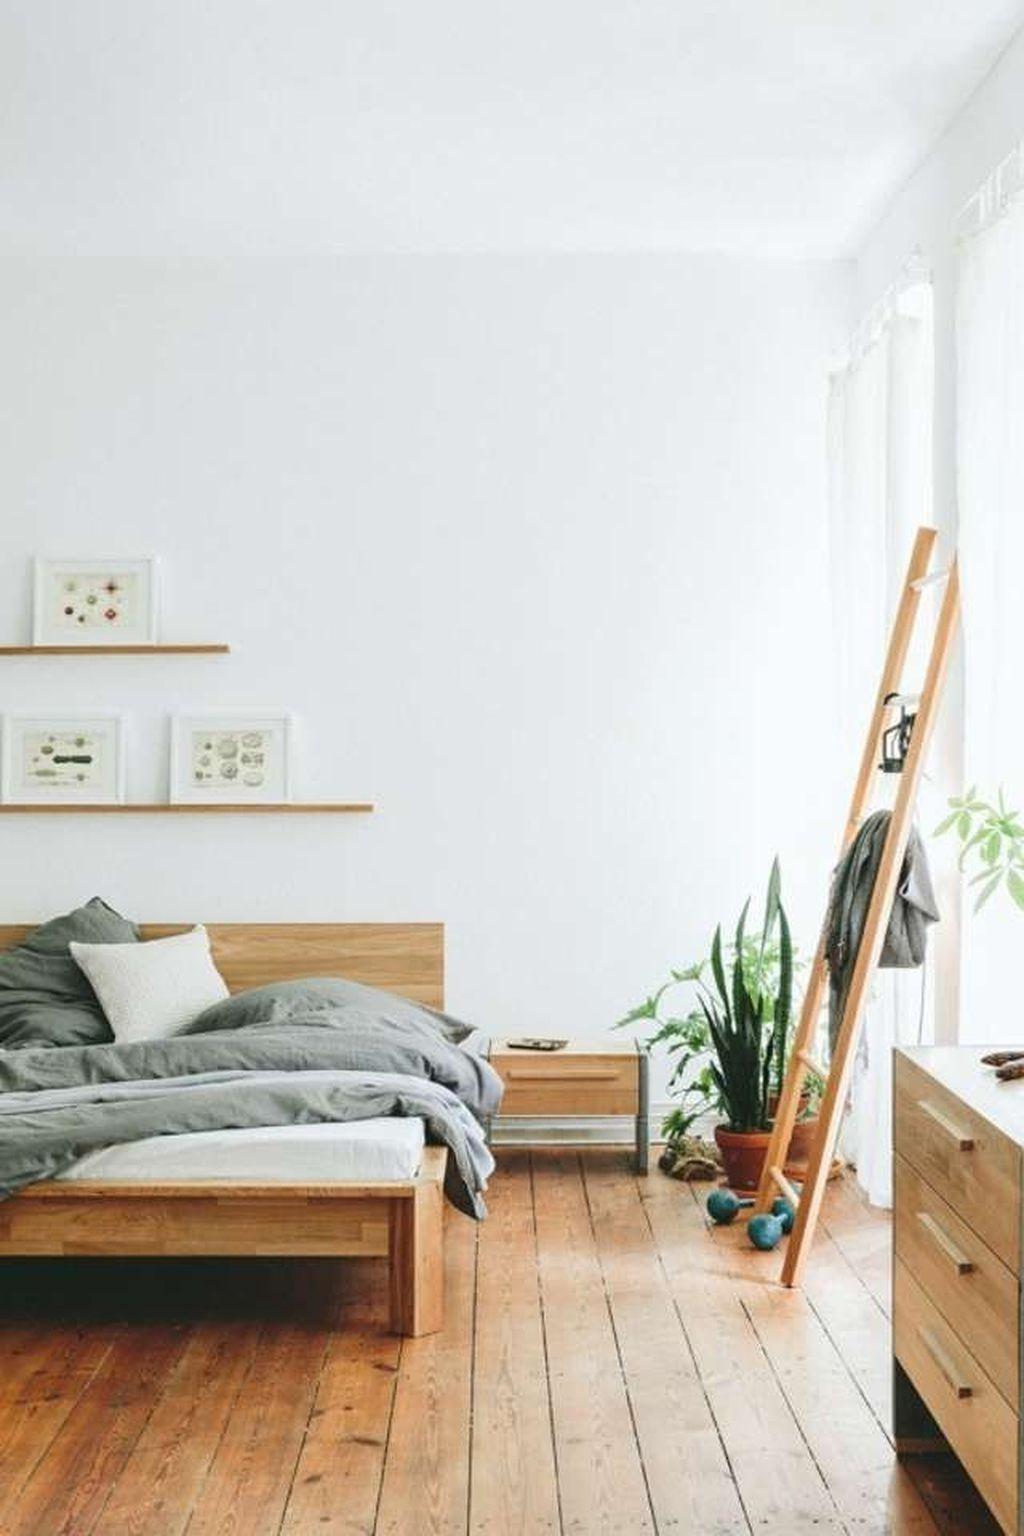 Best Minimalist Bedroom Ideas Decoration en 2020